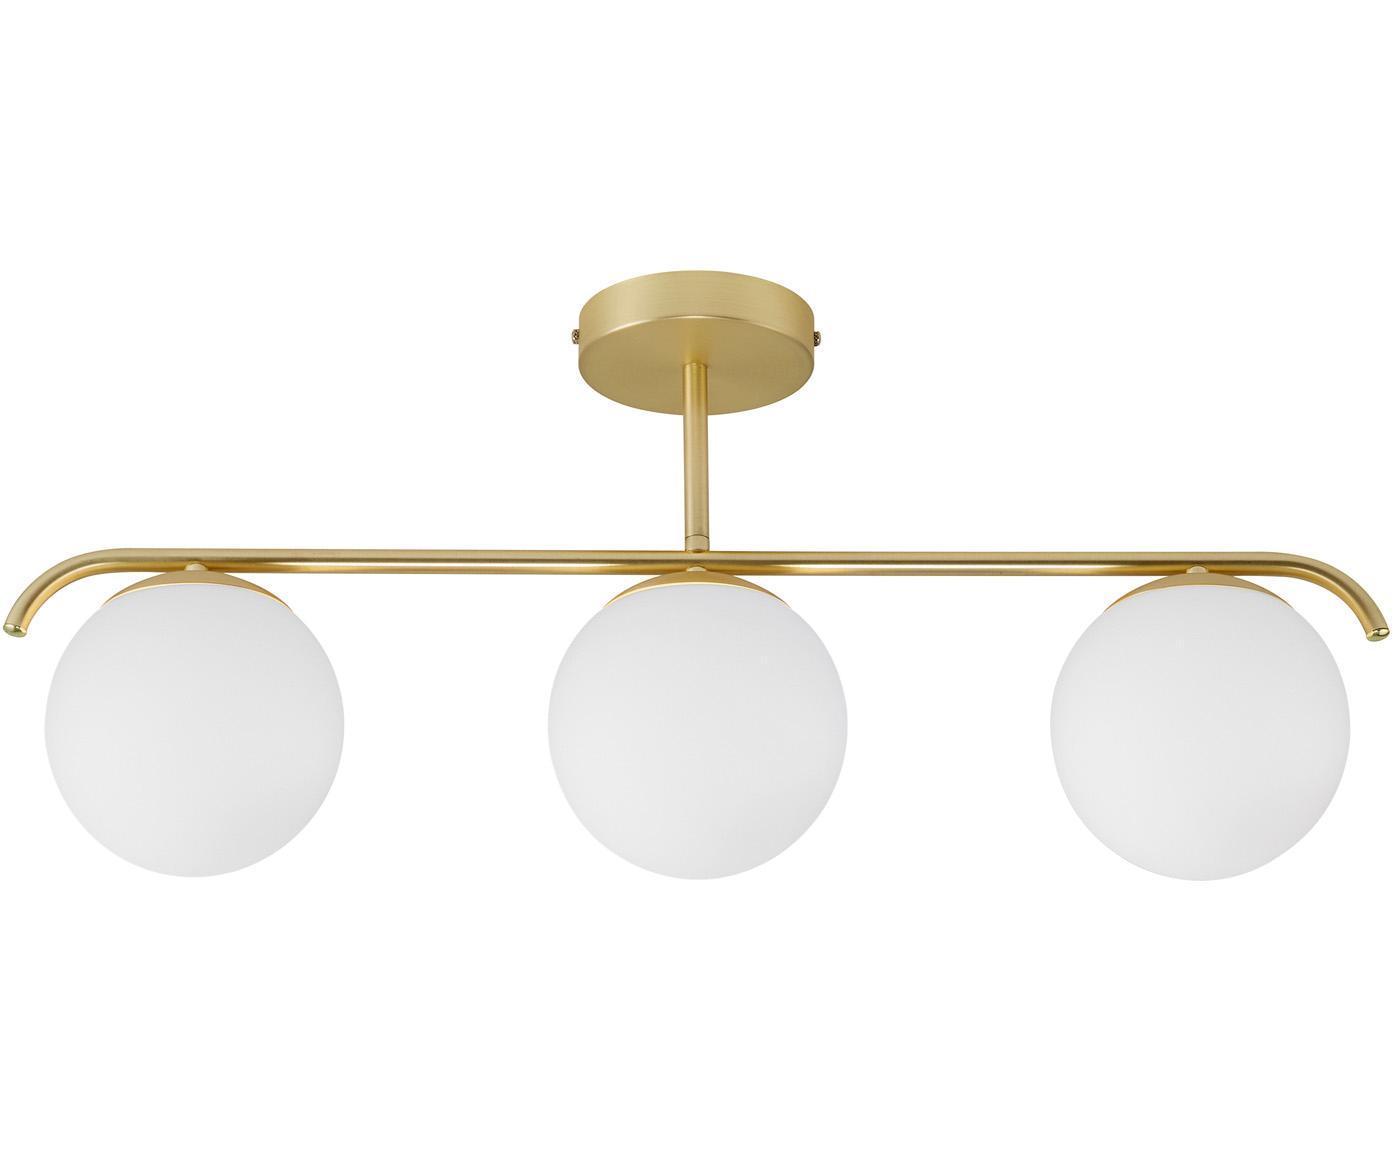 Deckenleuchte Grant aus Opalglas, Lampenschirm: Opalglas, Baldachin: Metall, beschichtet, Weiß, Gold, 70 x 30 cm